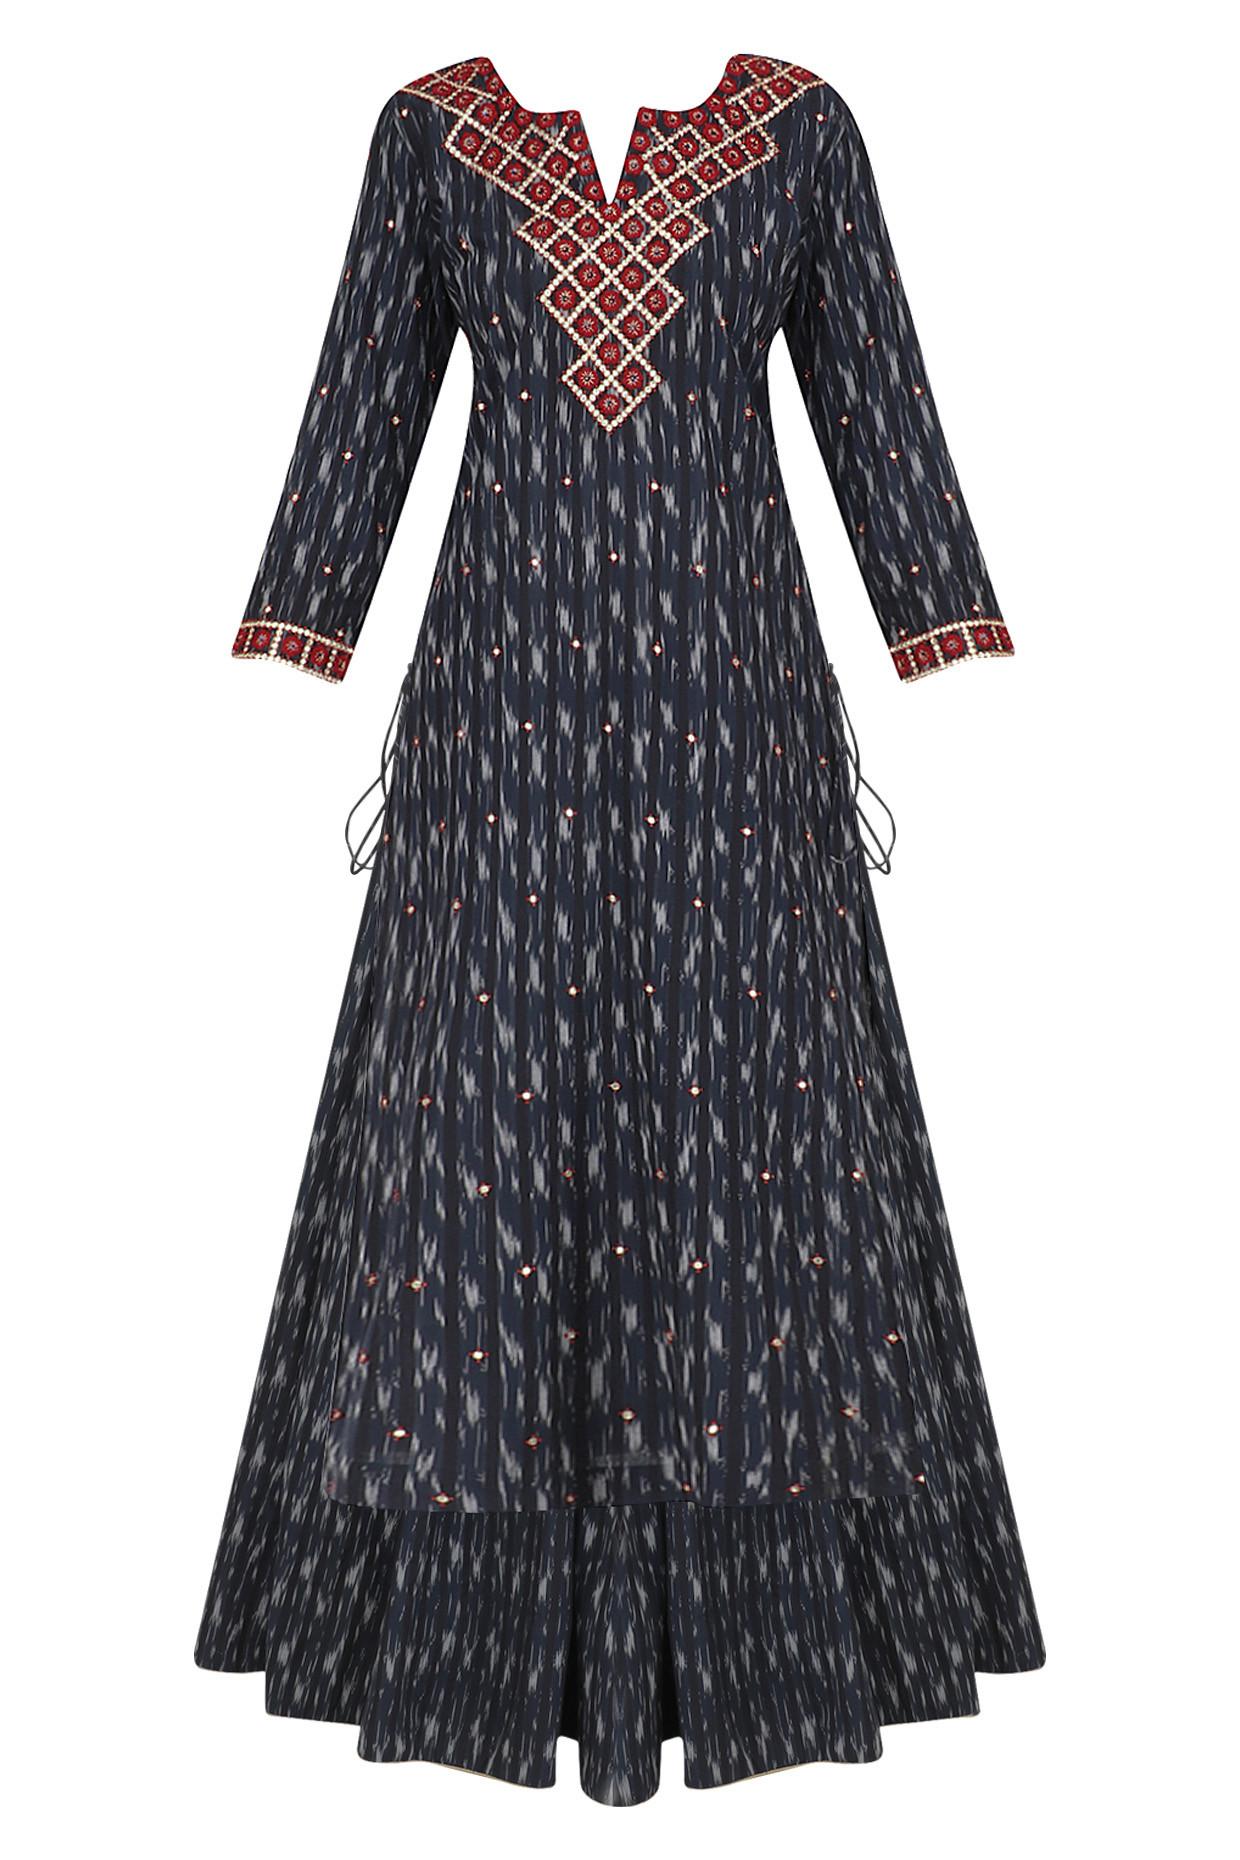 Indigo Blue Ikkat Print Kurta and Skirt Set by Surendri